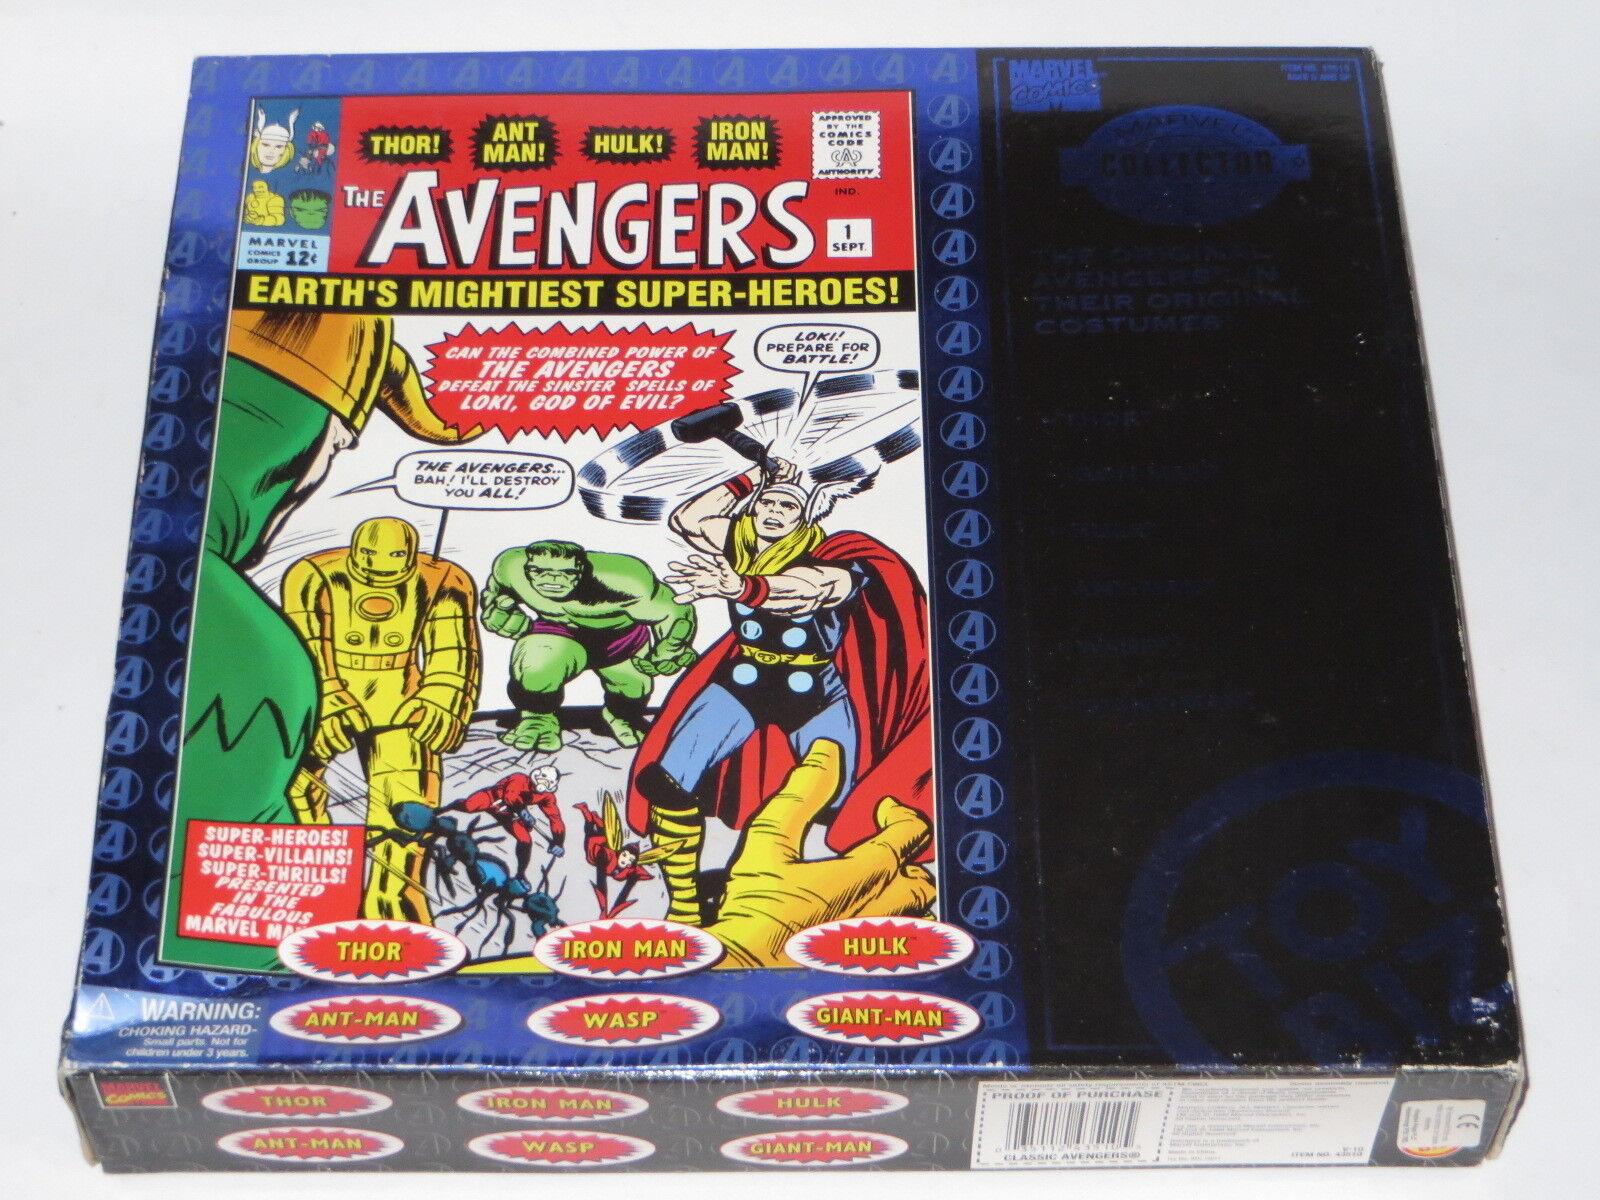 Vintage toy biz the avengers classic original action figures set from comic